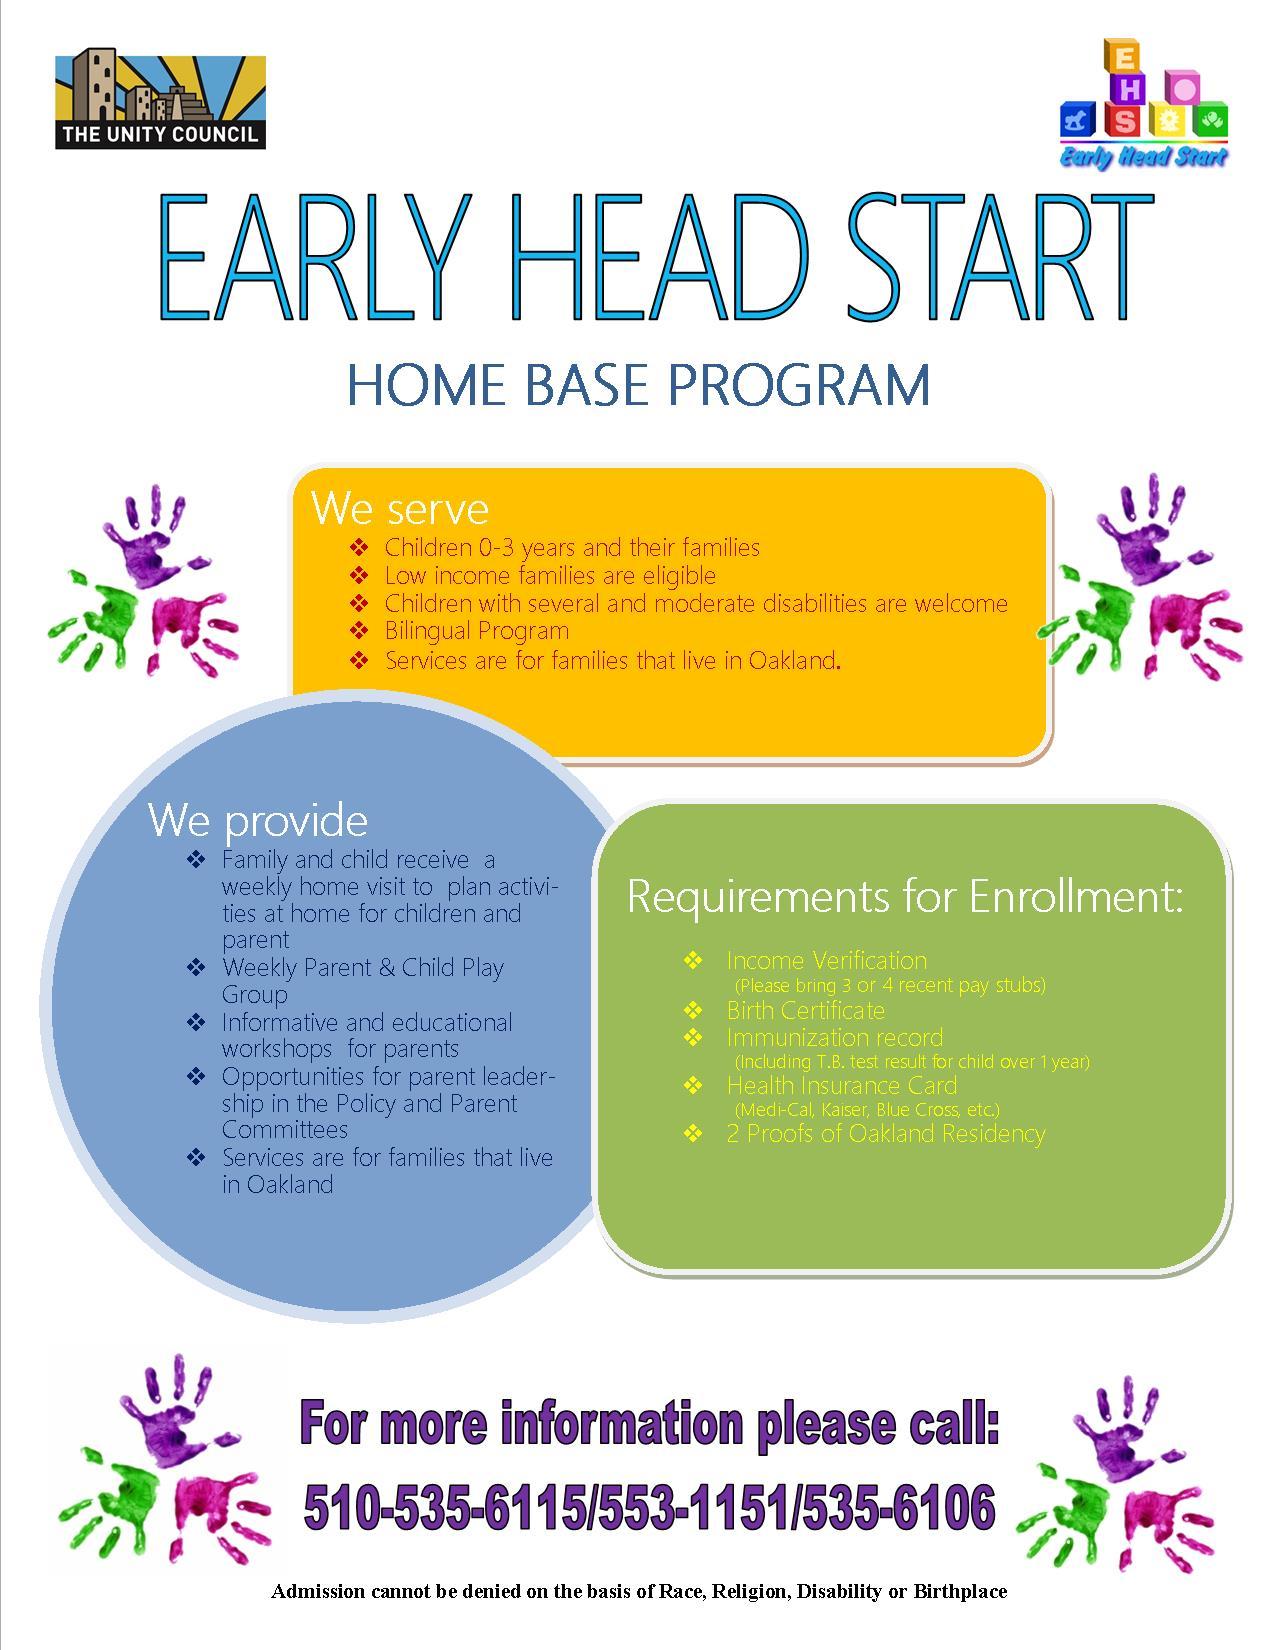 Early Head Start Home Base Program